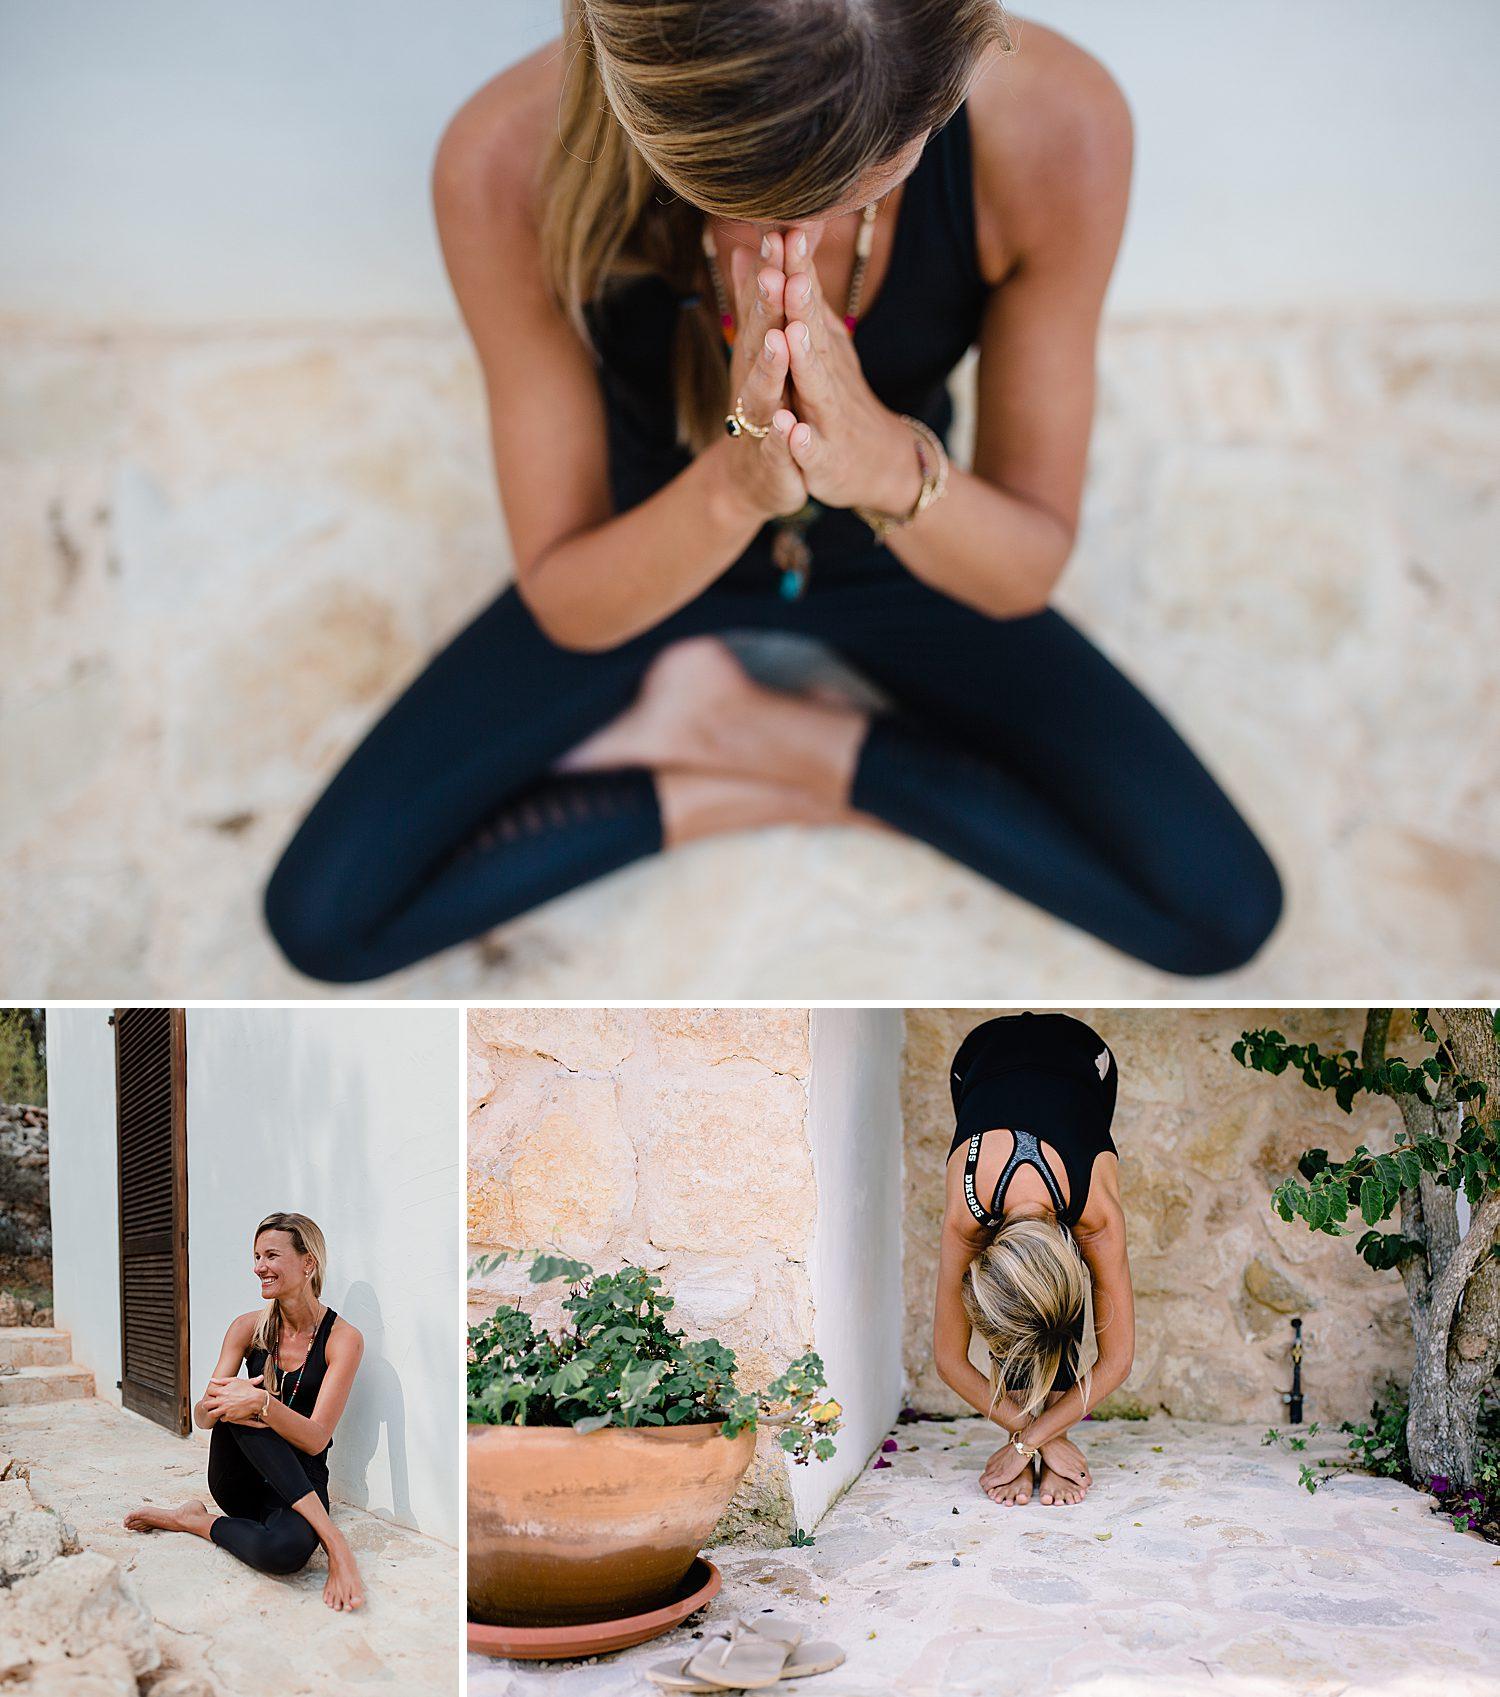 Zuiver Fotografie© fotoshoot Prashanti yogaretreat Ibiza